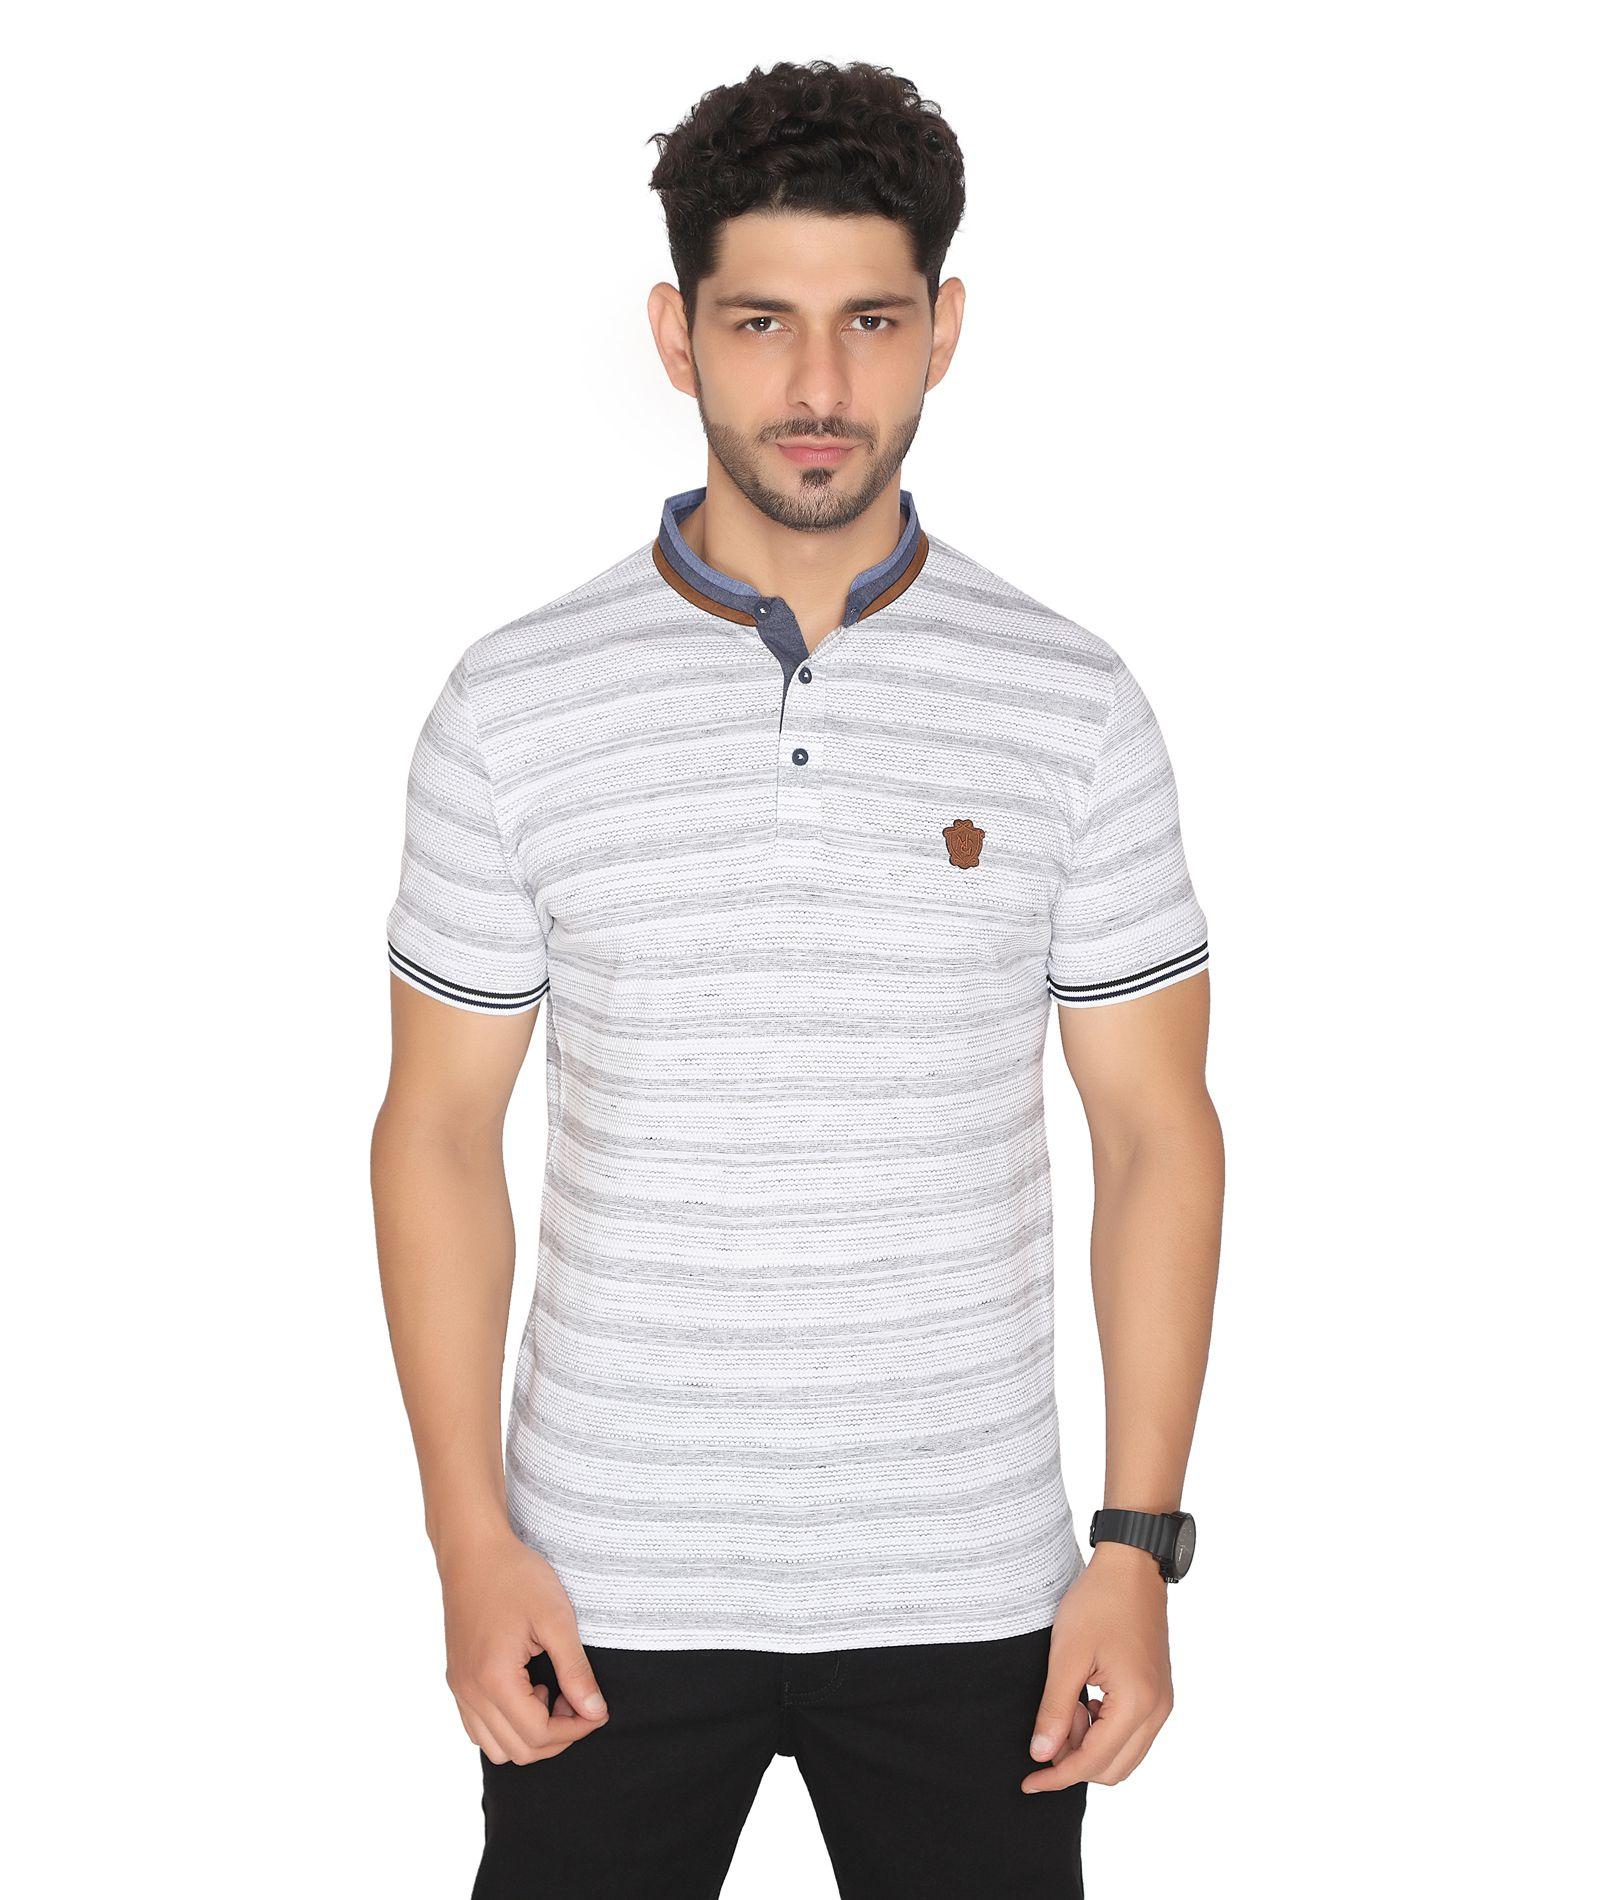 NEXGEN CLUB Cotton Blend White Striper T-Shirt